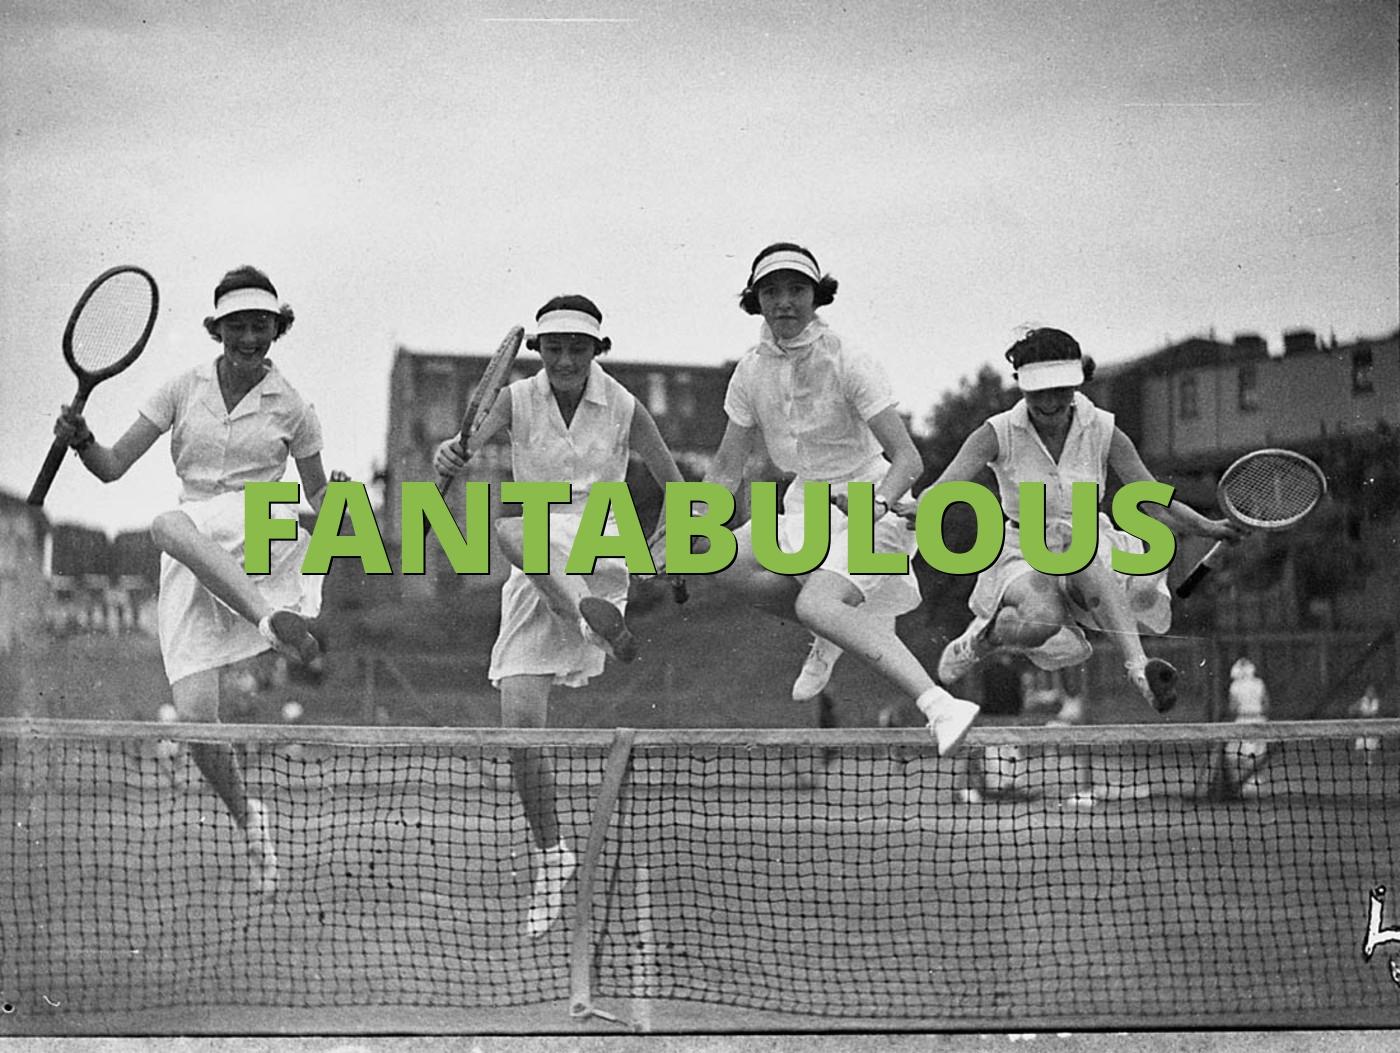 FANTABULOUS